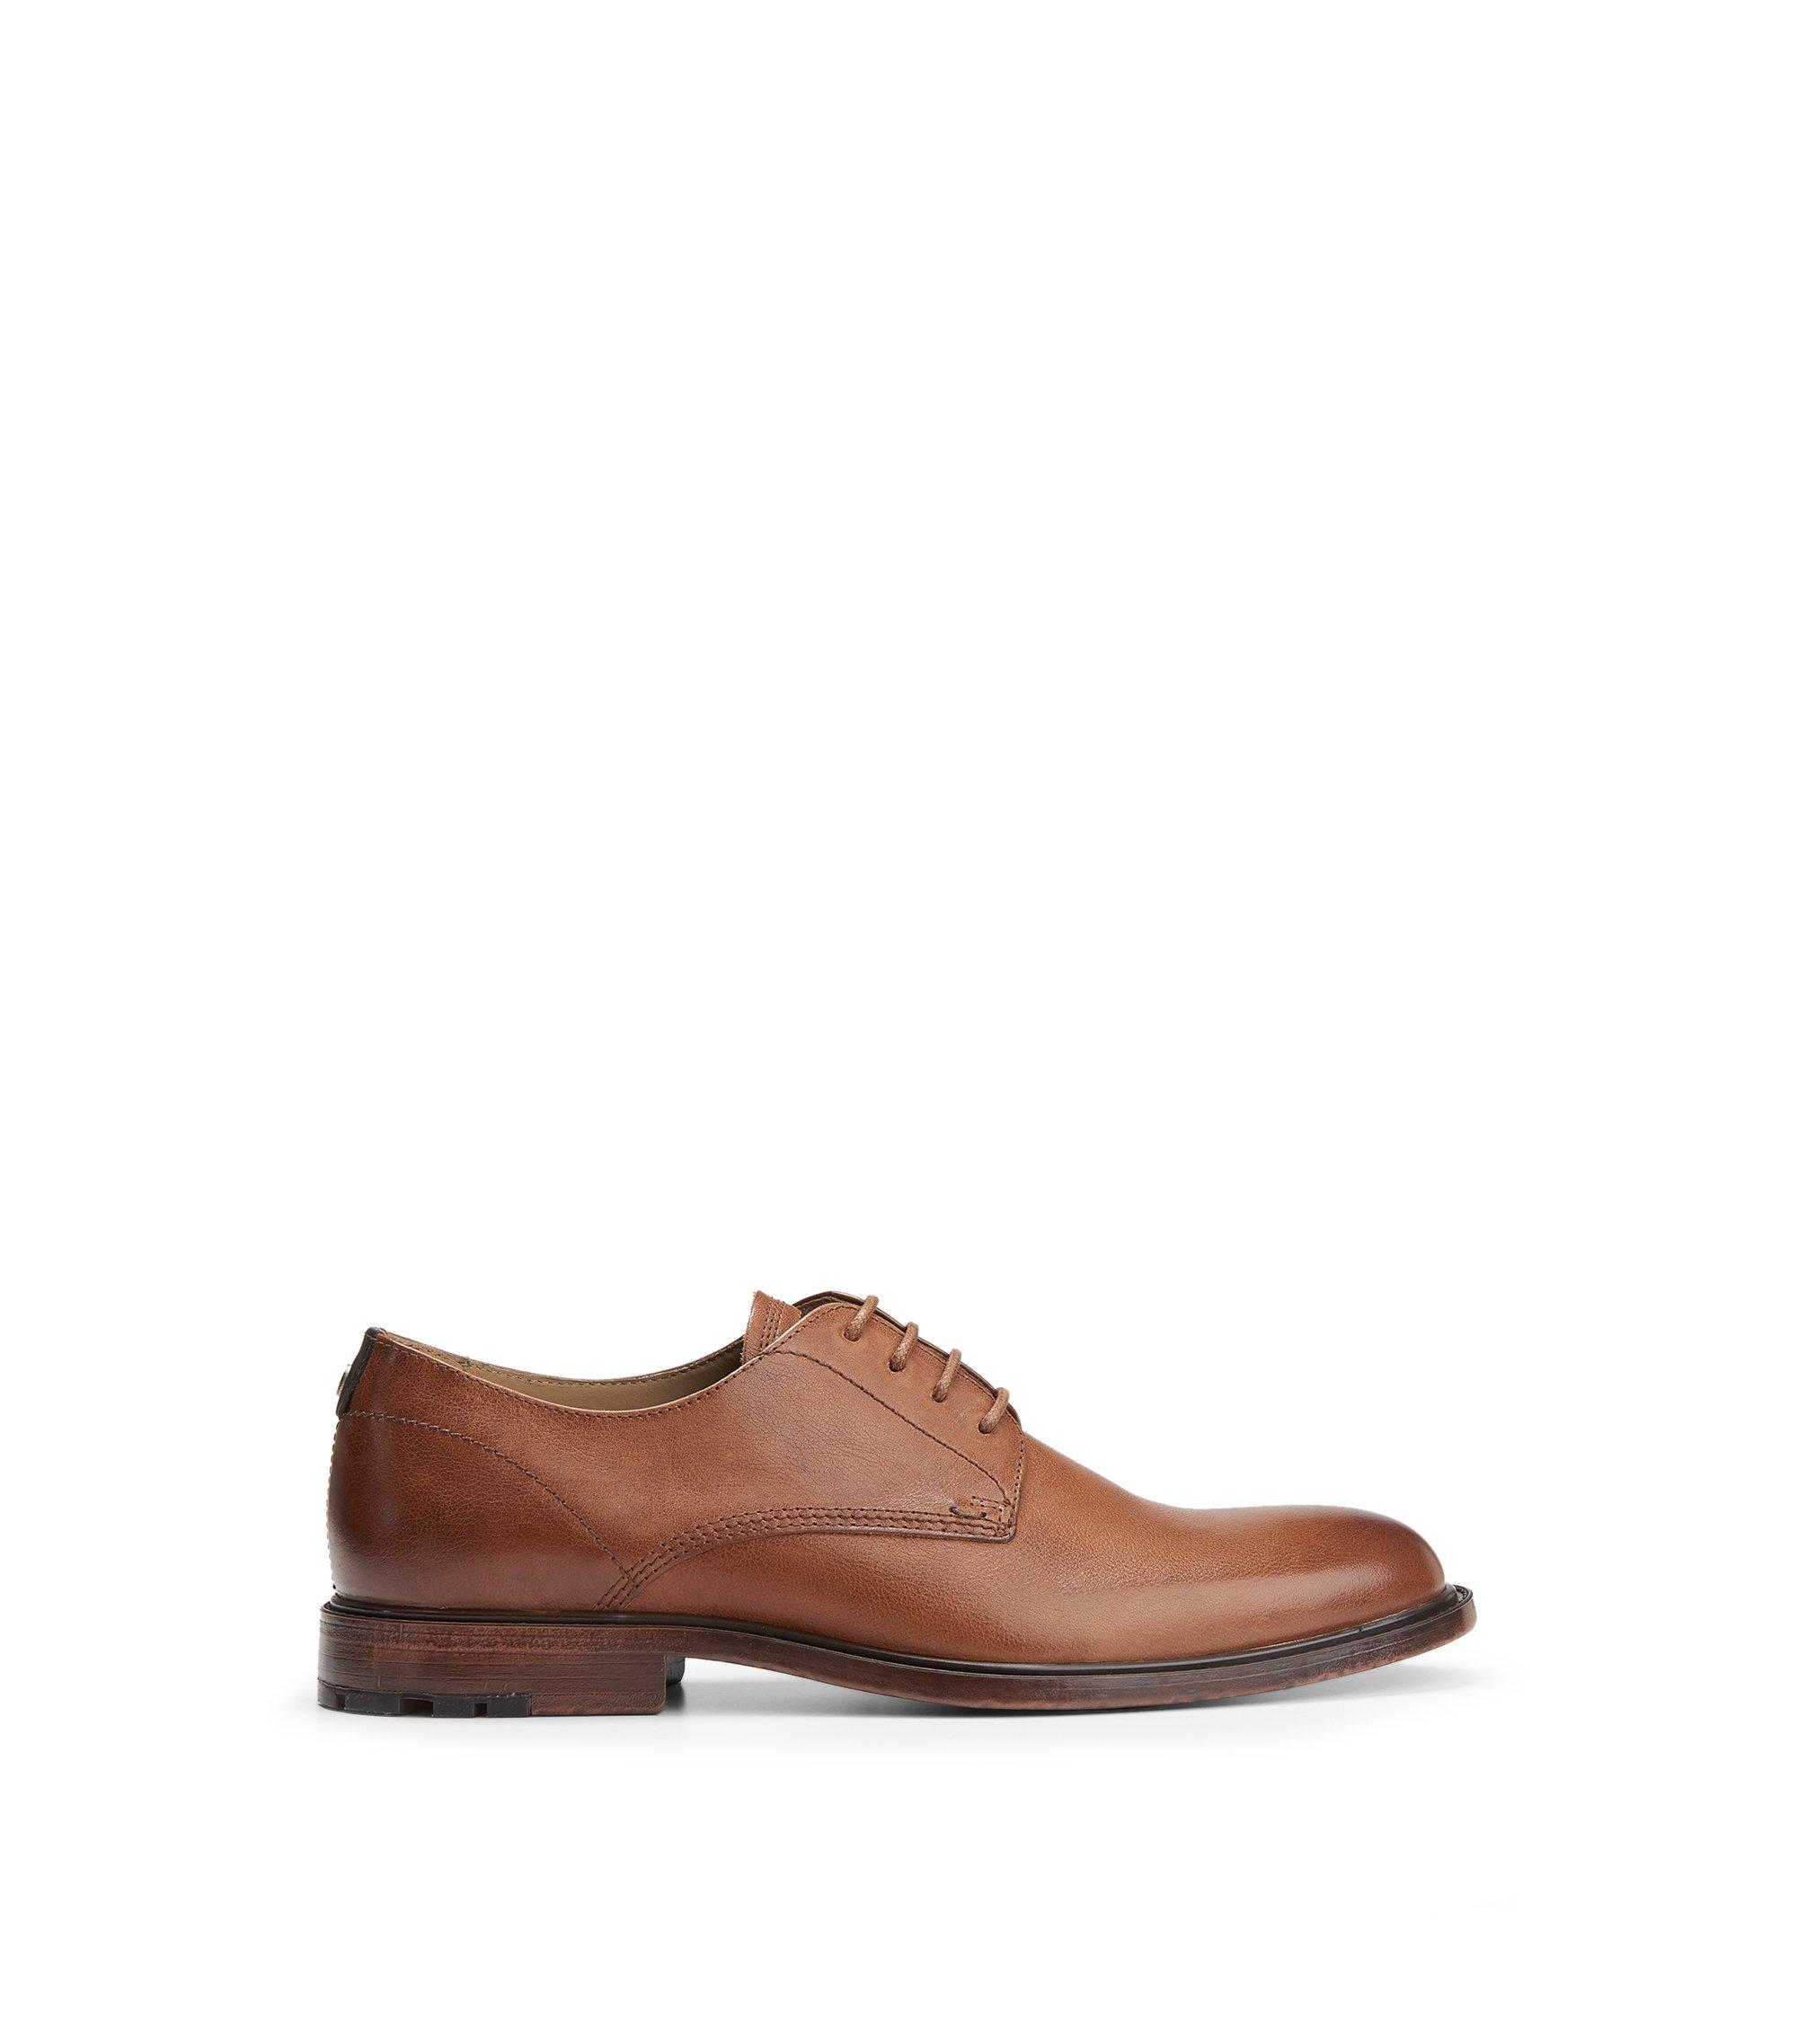 Leather Derby Dress Shoe | Cultroot Derb ltws, Brown